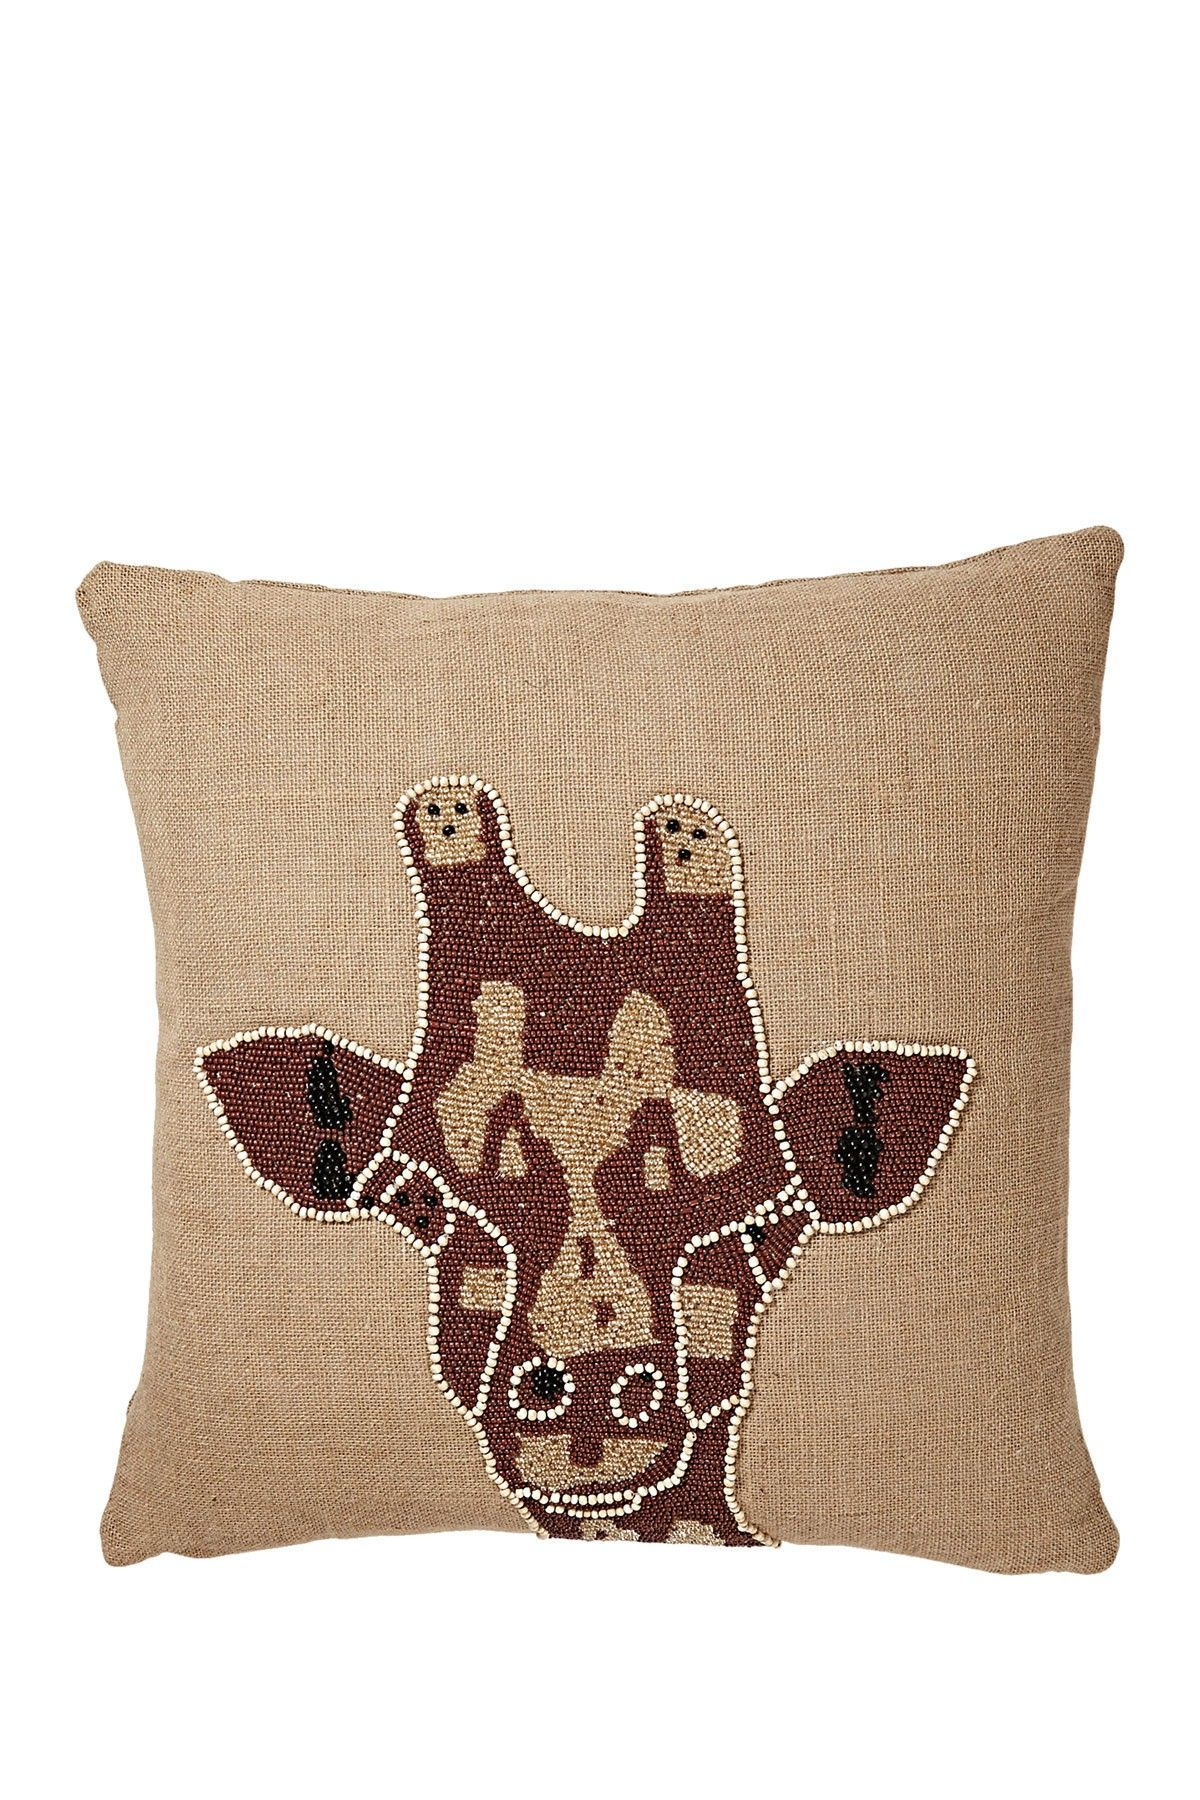 "Nairobi Brown Giraffe Head 2 Self Welt Jute Pillow - 20"" x 20"" on HauteLook  (Thro Home)"